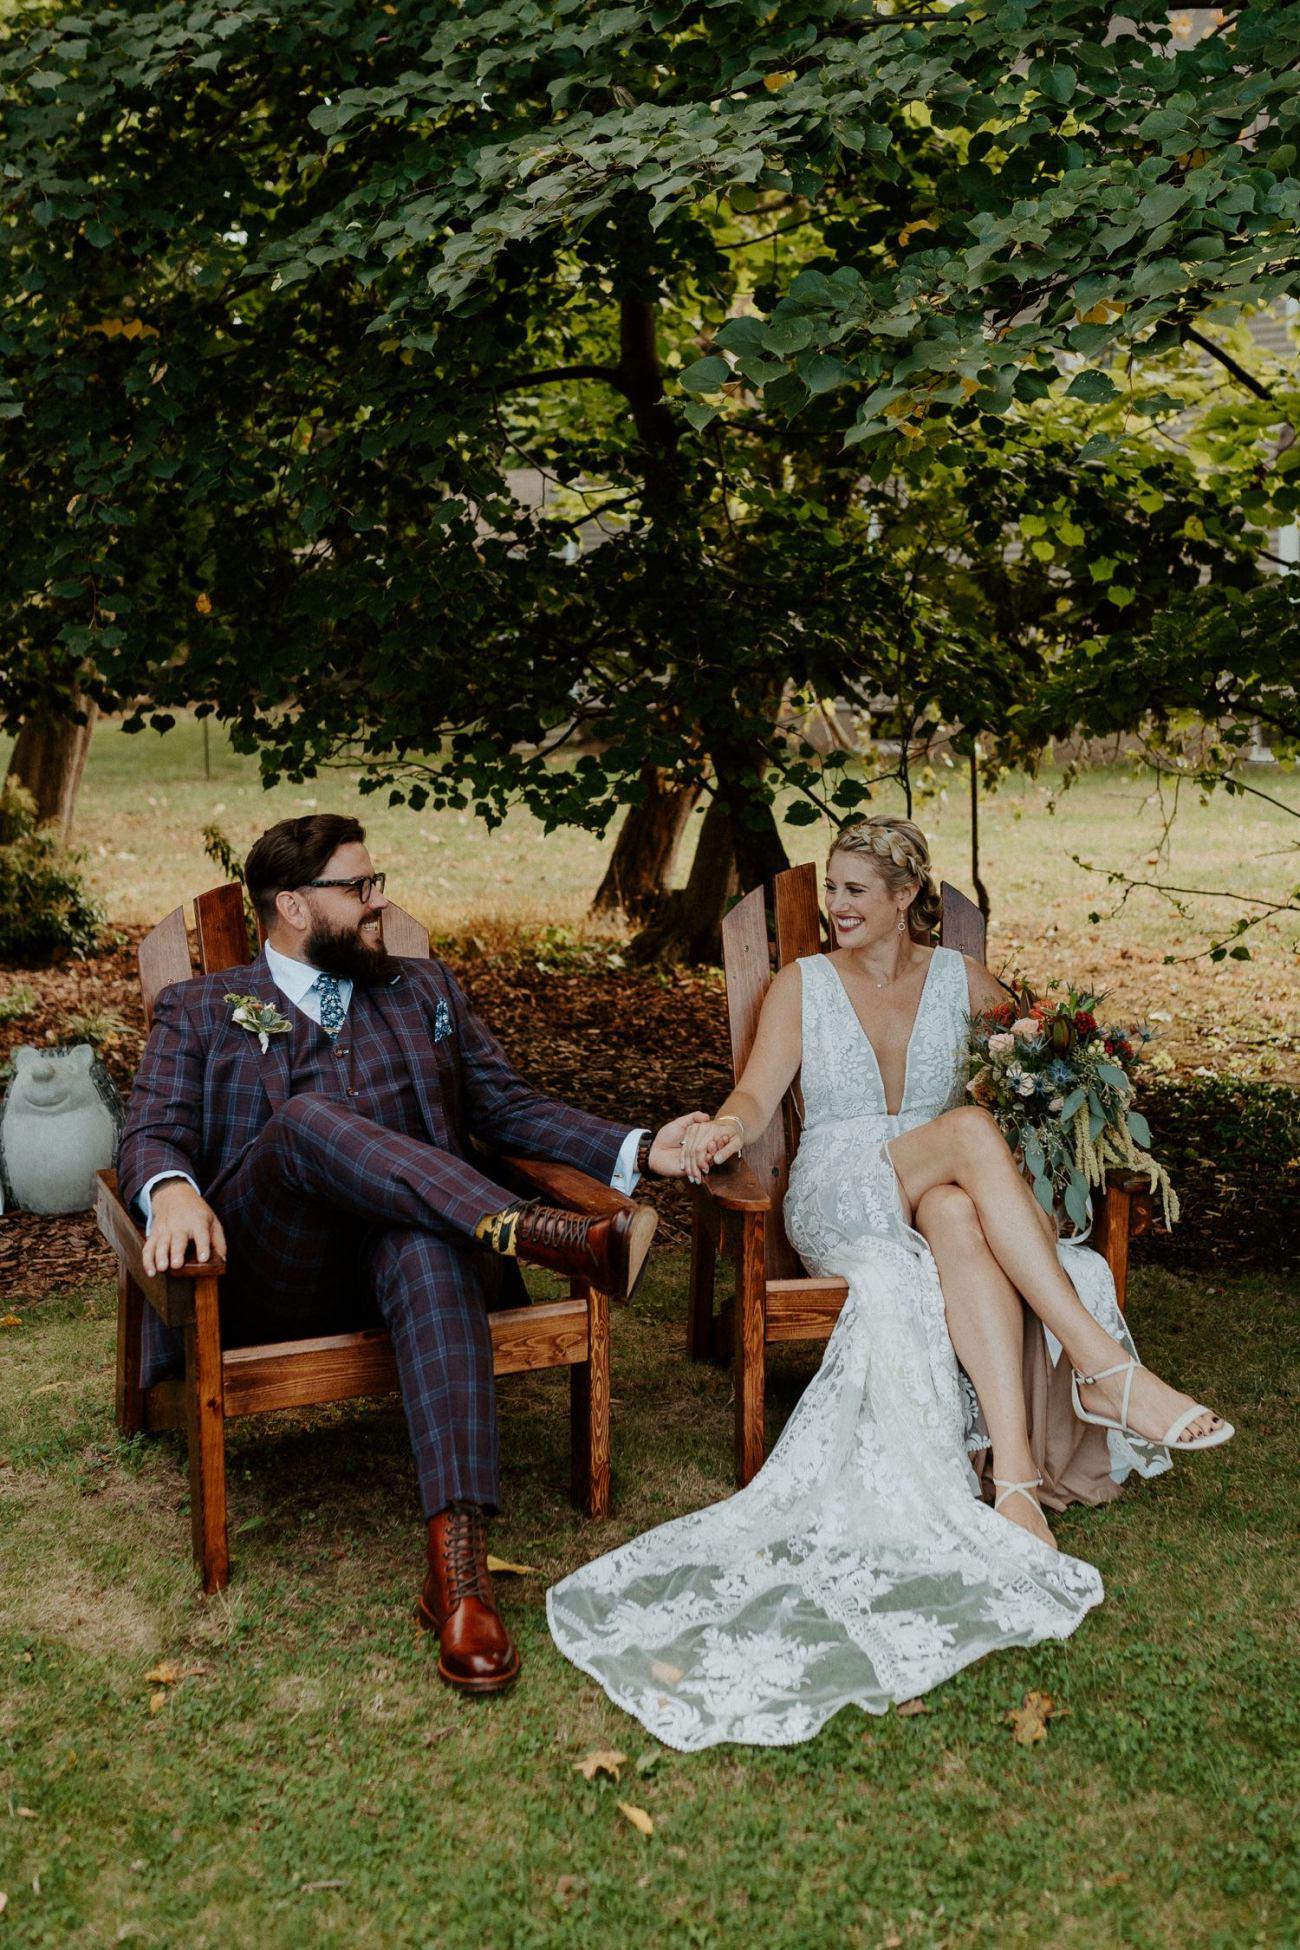 New Jersey Fall Backyard Wedding Bend Wedding Photographer NJ Wedding Photographer Anais Possamai Photography 011